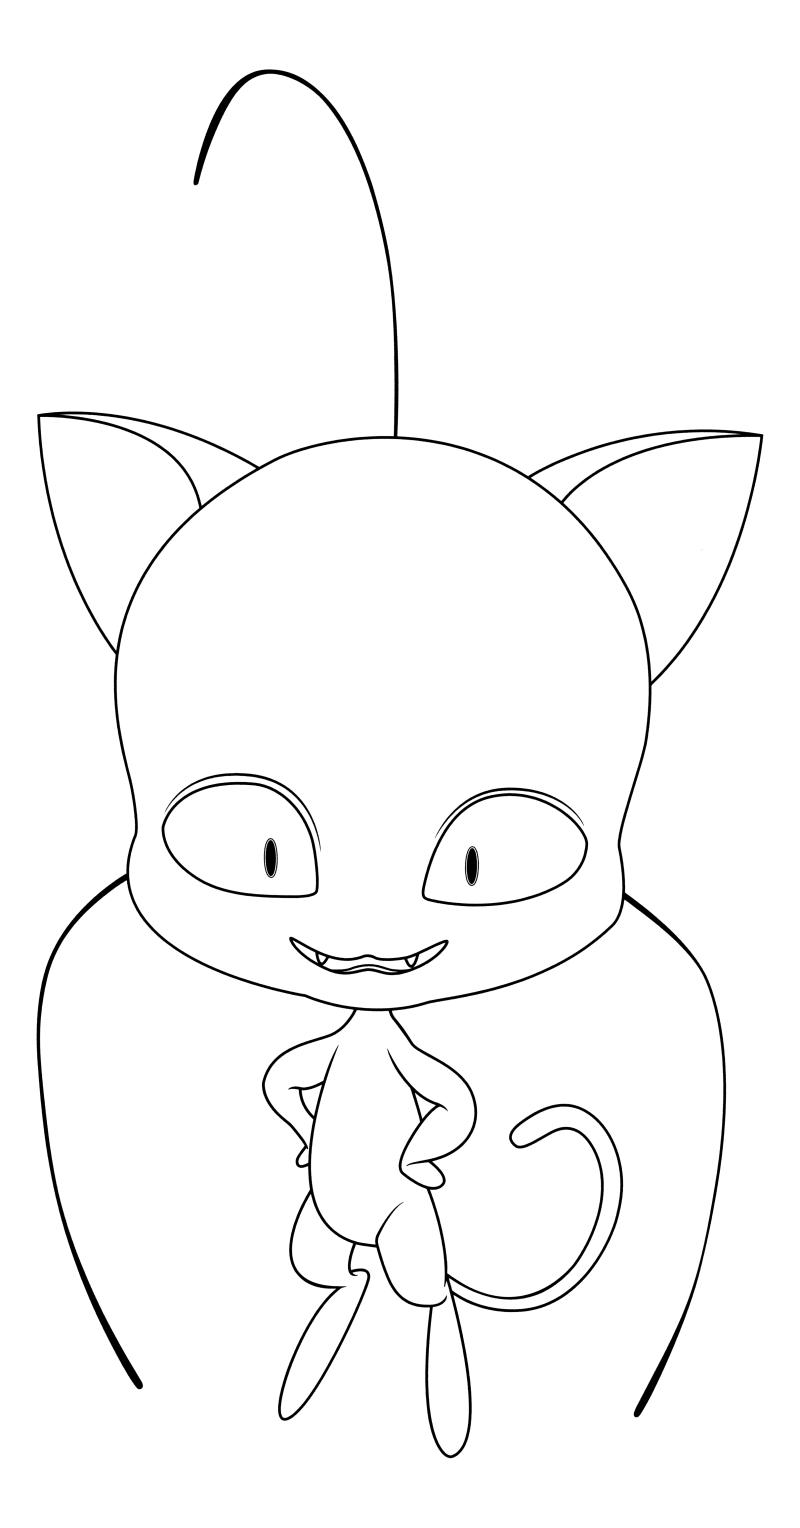 Картинки квами для срисовки карандашом